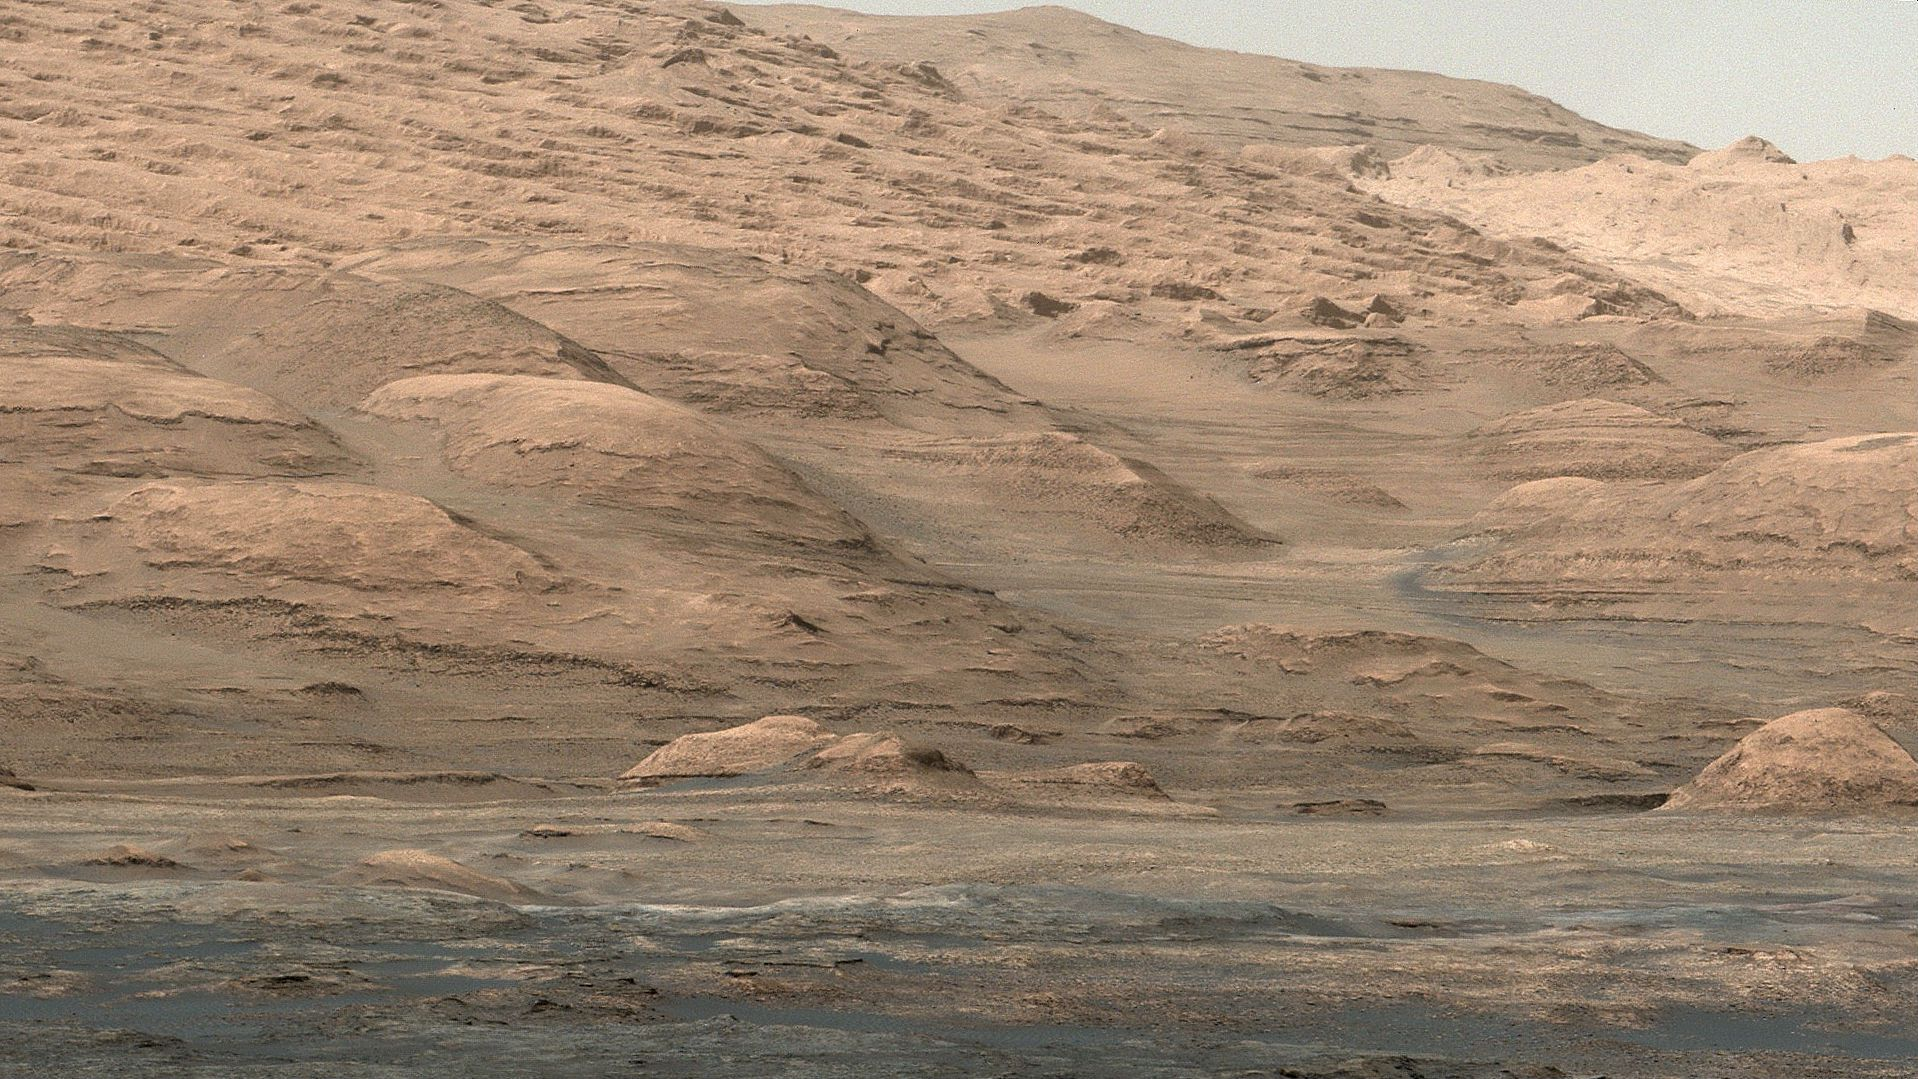 Mount Sharp, Mars